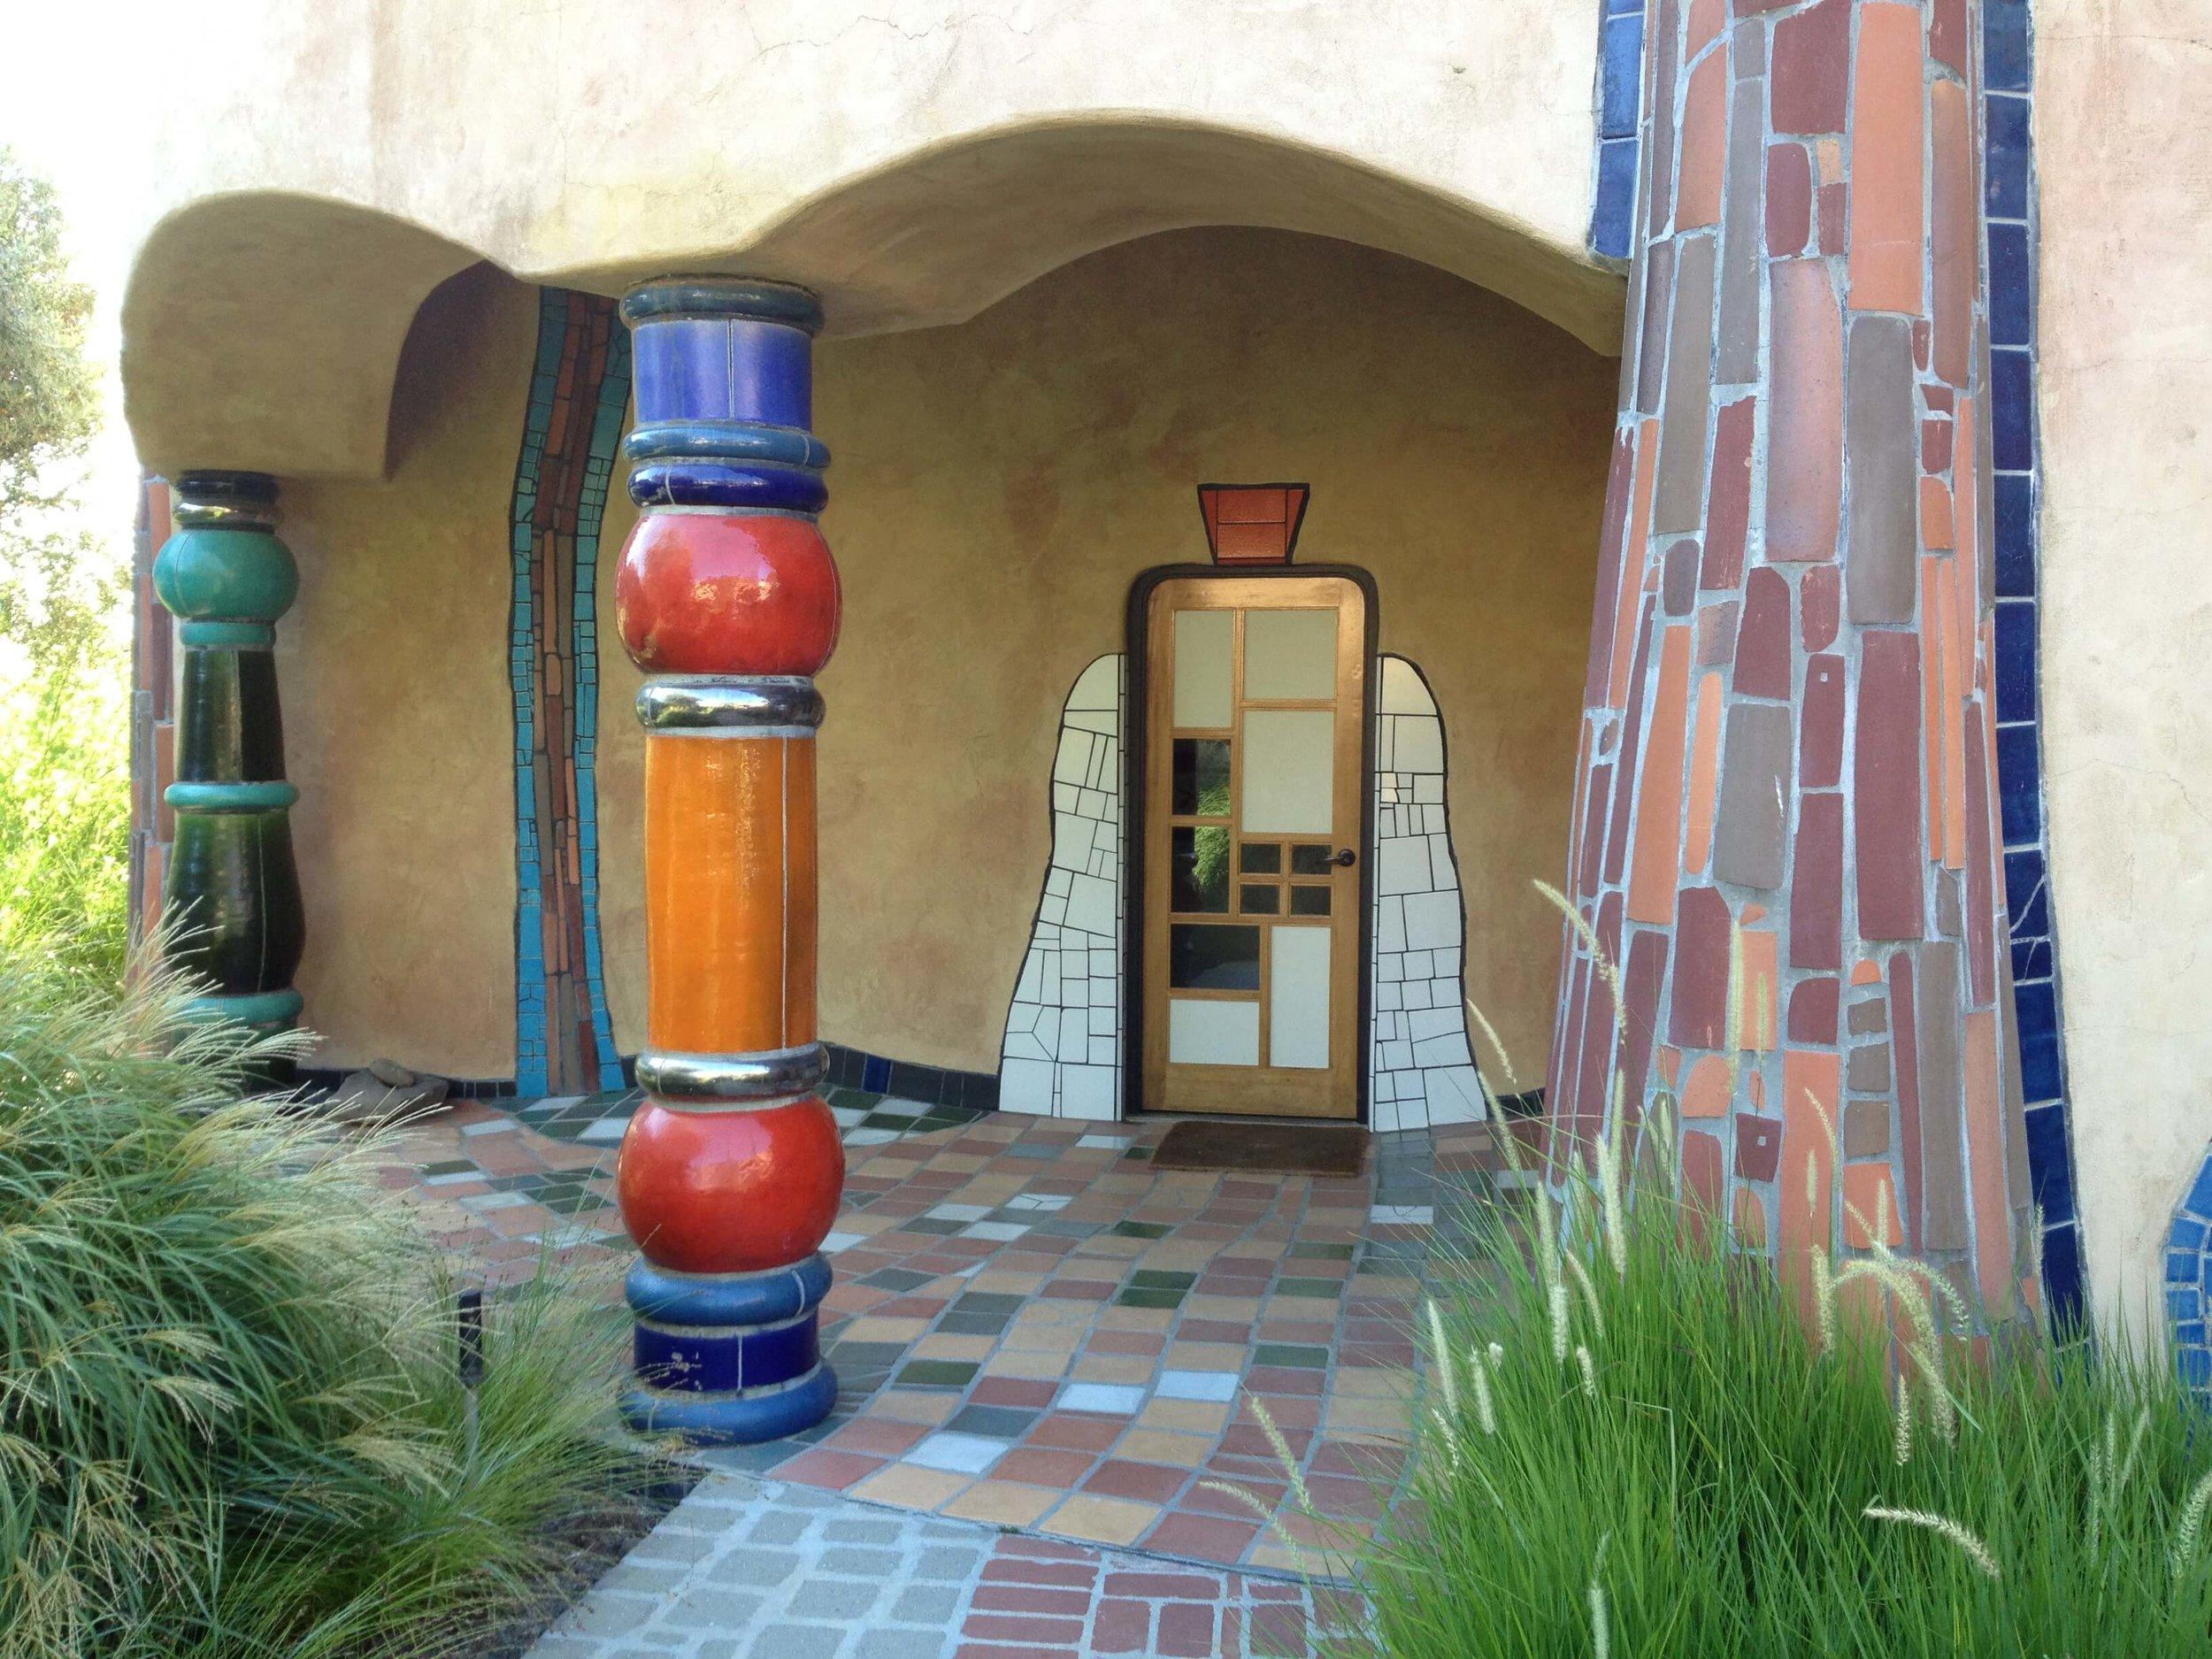 Quixote Winery designed by Hundertwasser